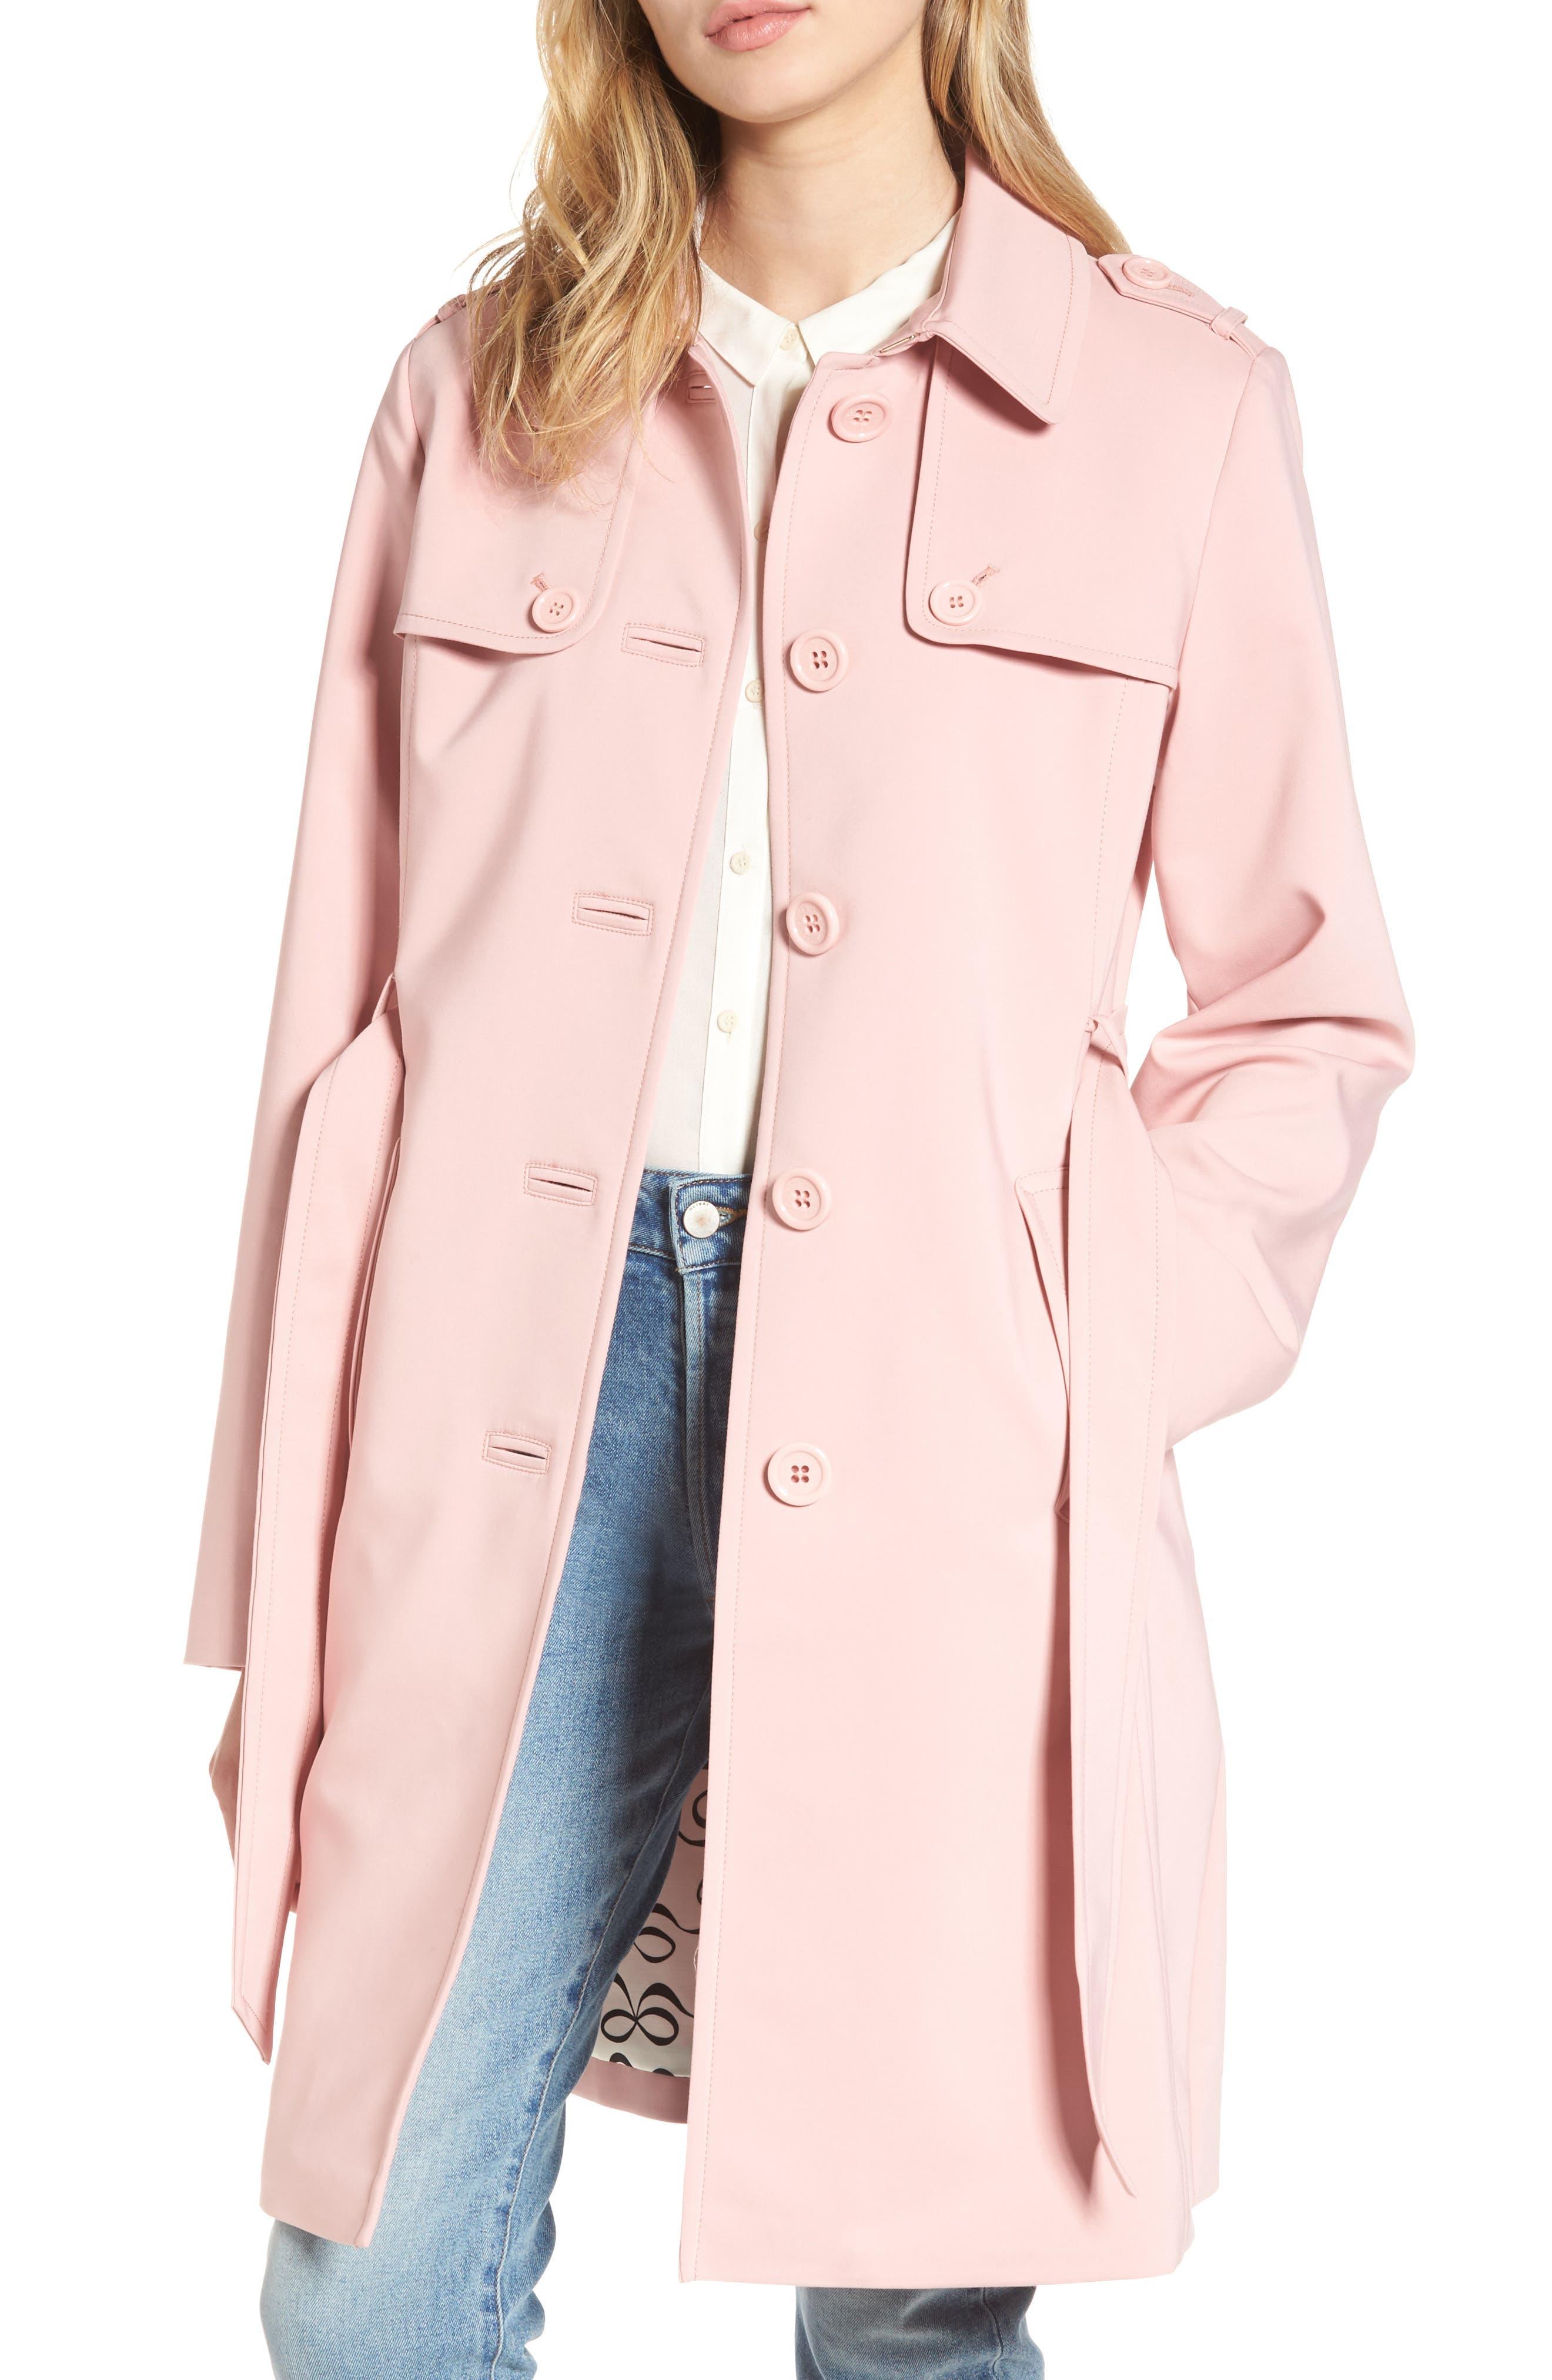 Alternate Image 1 Selected - kate spade new york 3-in-1 trench coat